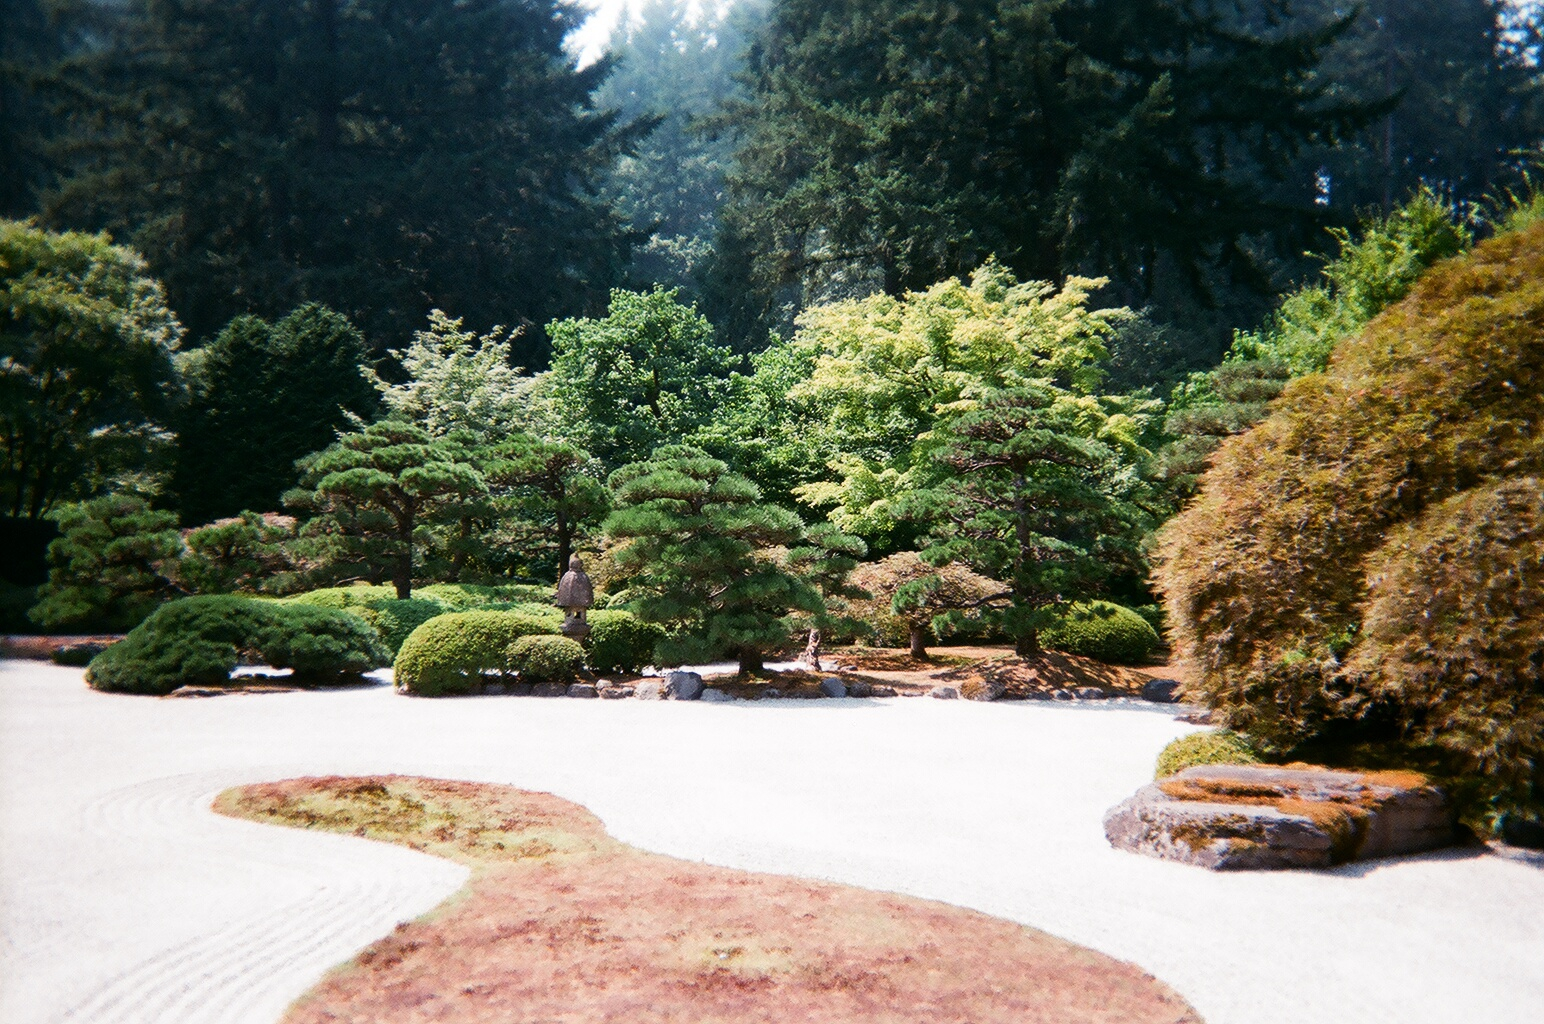 zen garden. august 2017 - fujifilm - unhannahm | ello